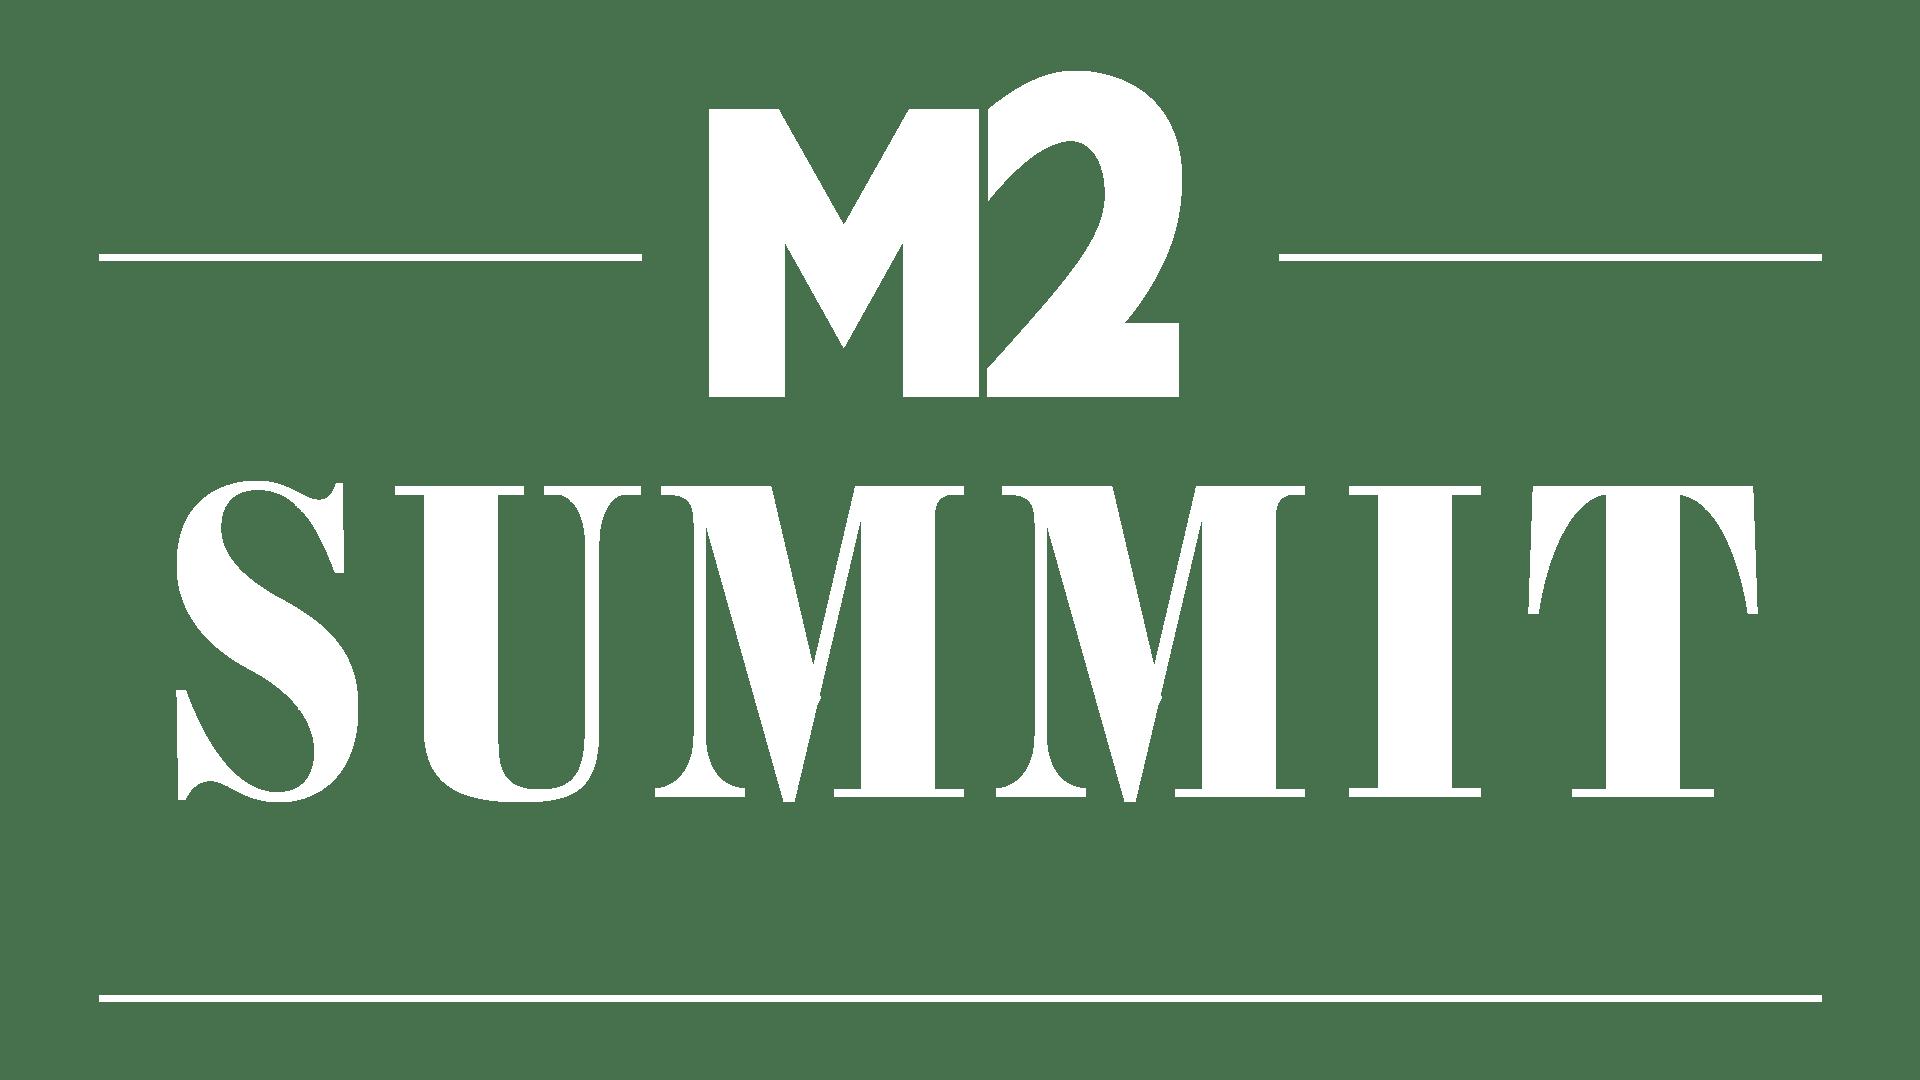 m2-summit-logo